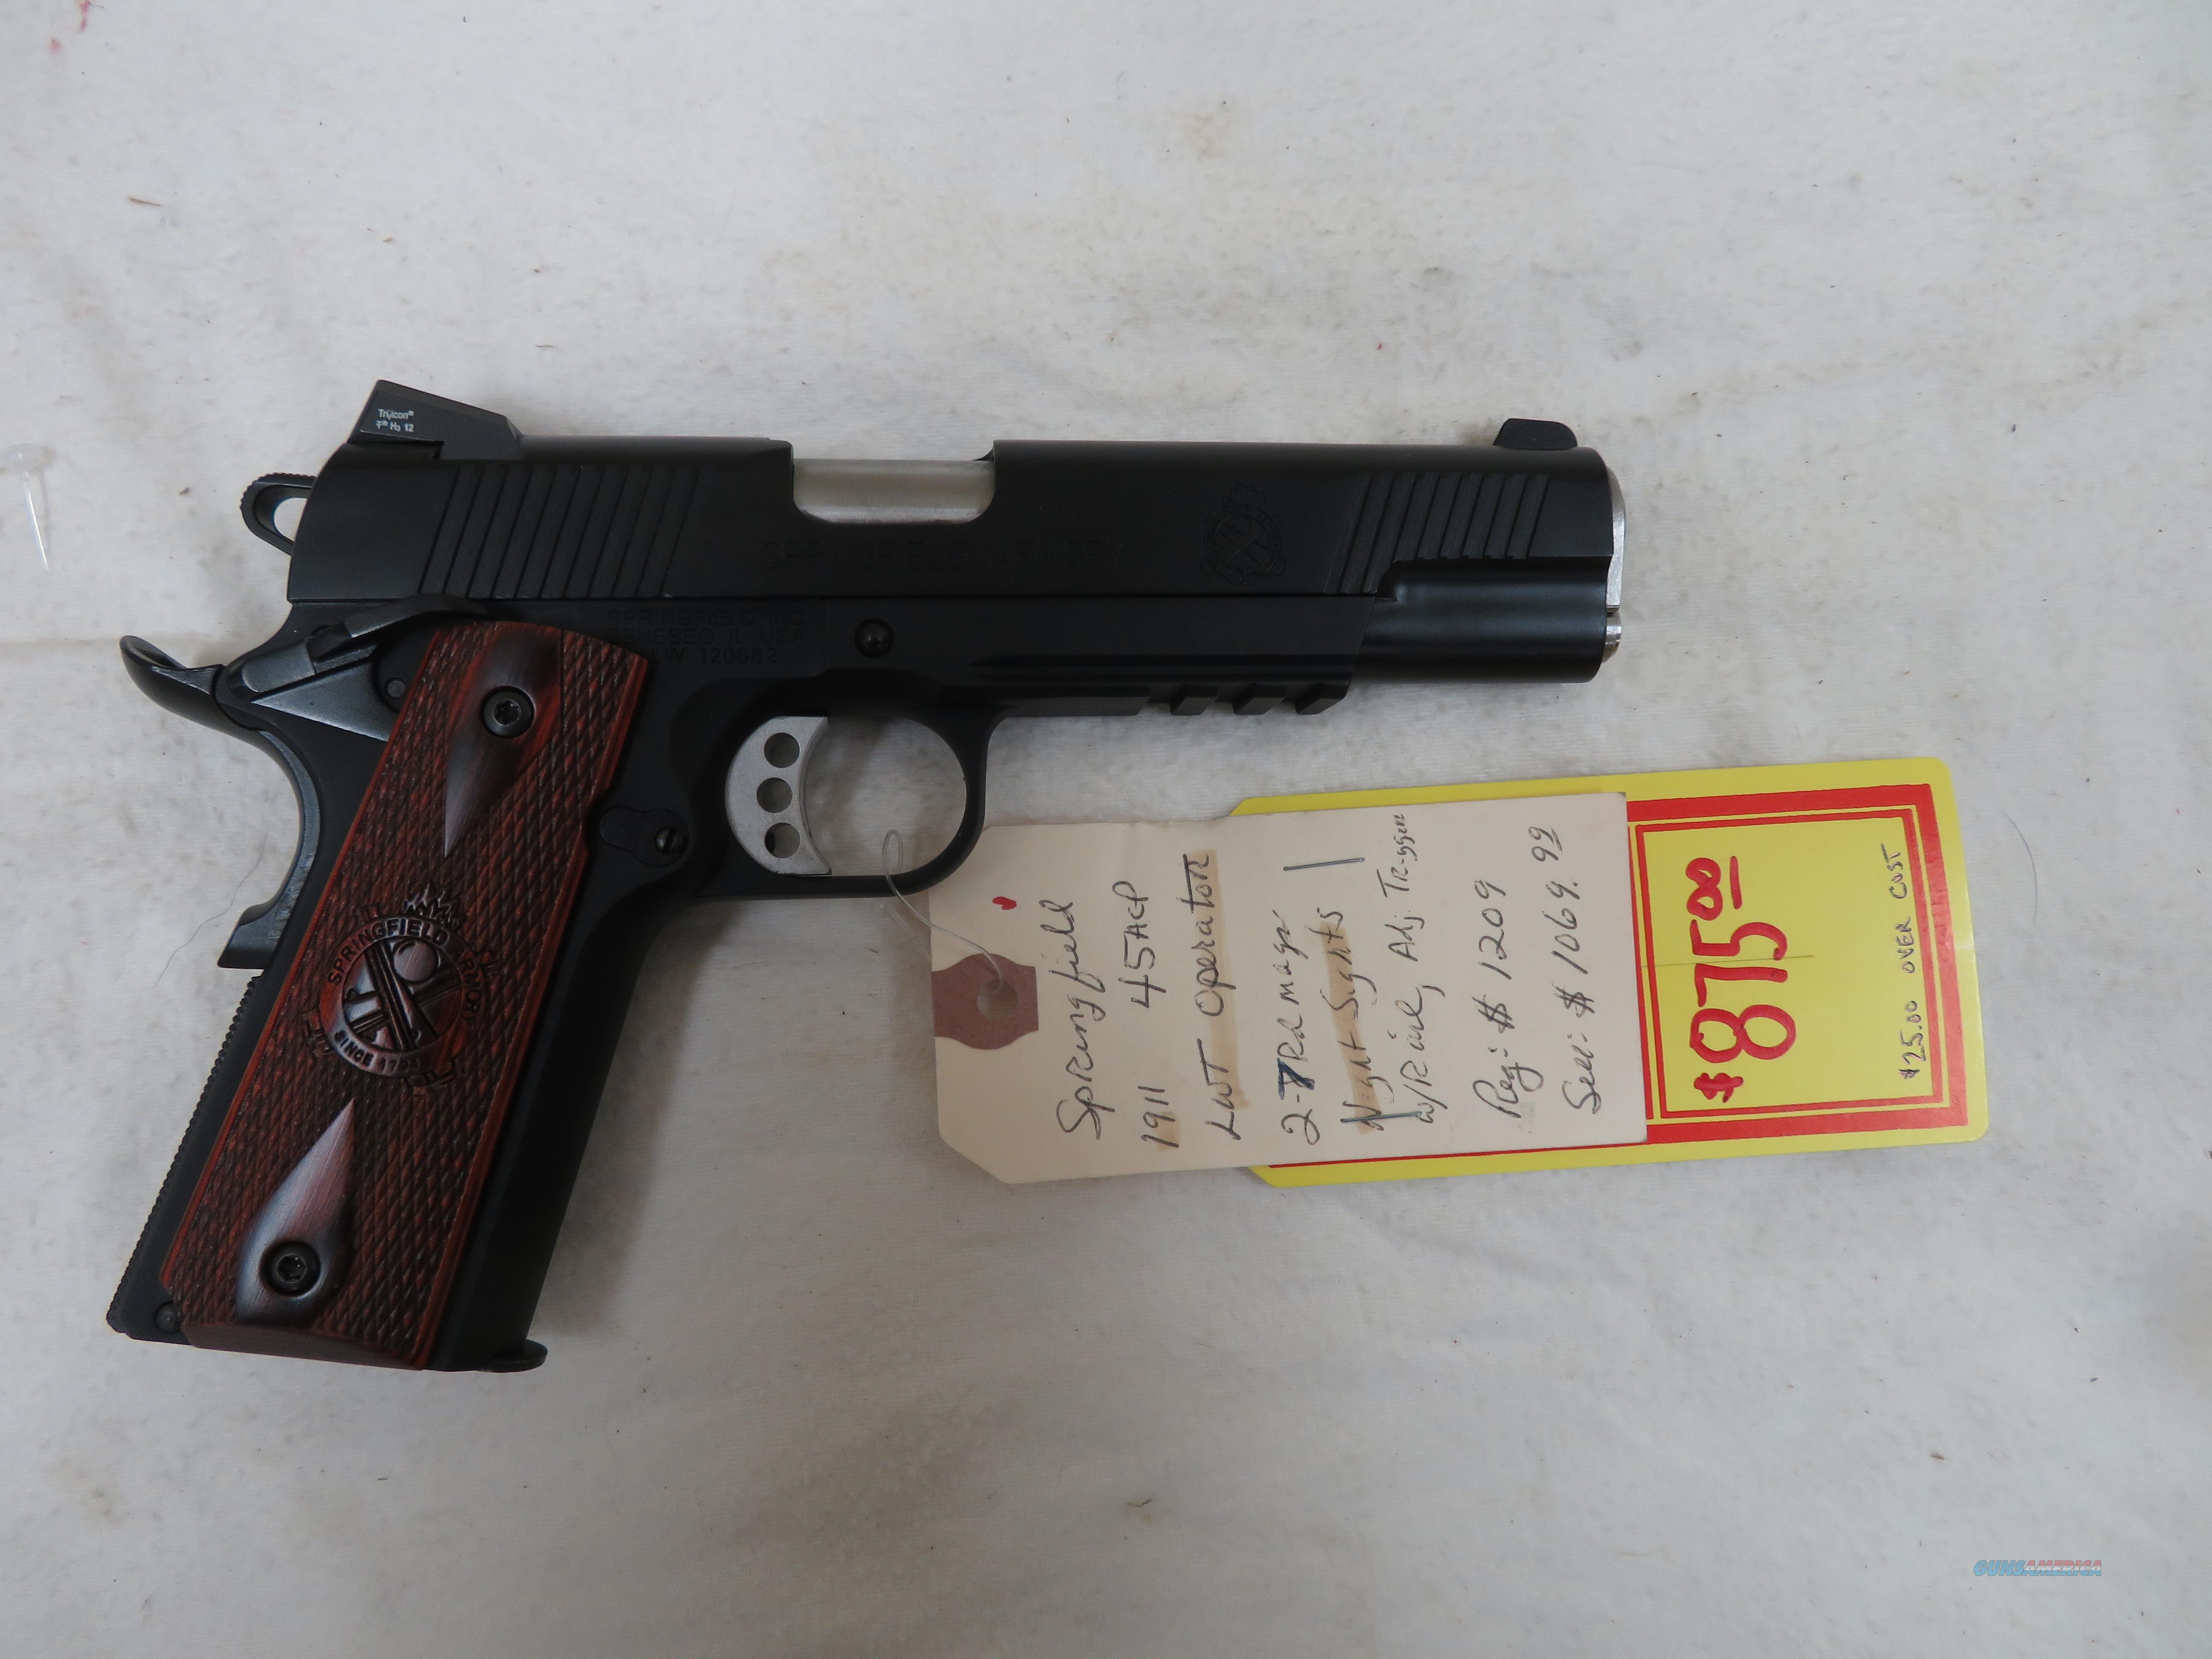 "SPRINGFIELD ARMORY 1911 LIGHTWEIGHT OPERATOR .45ACP 5""  Guns > Pistols > Springfield Armory Pistols > 1911 Type"